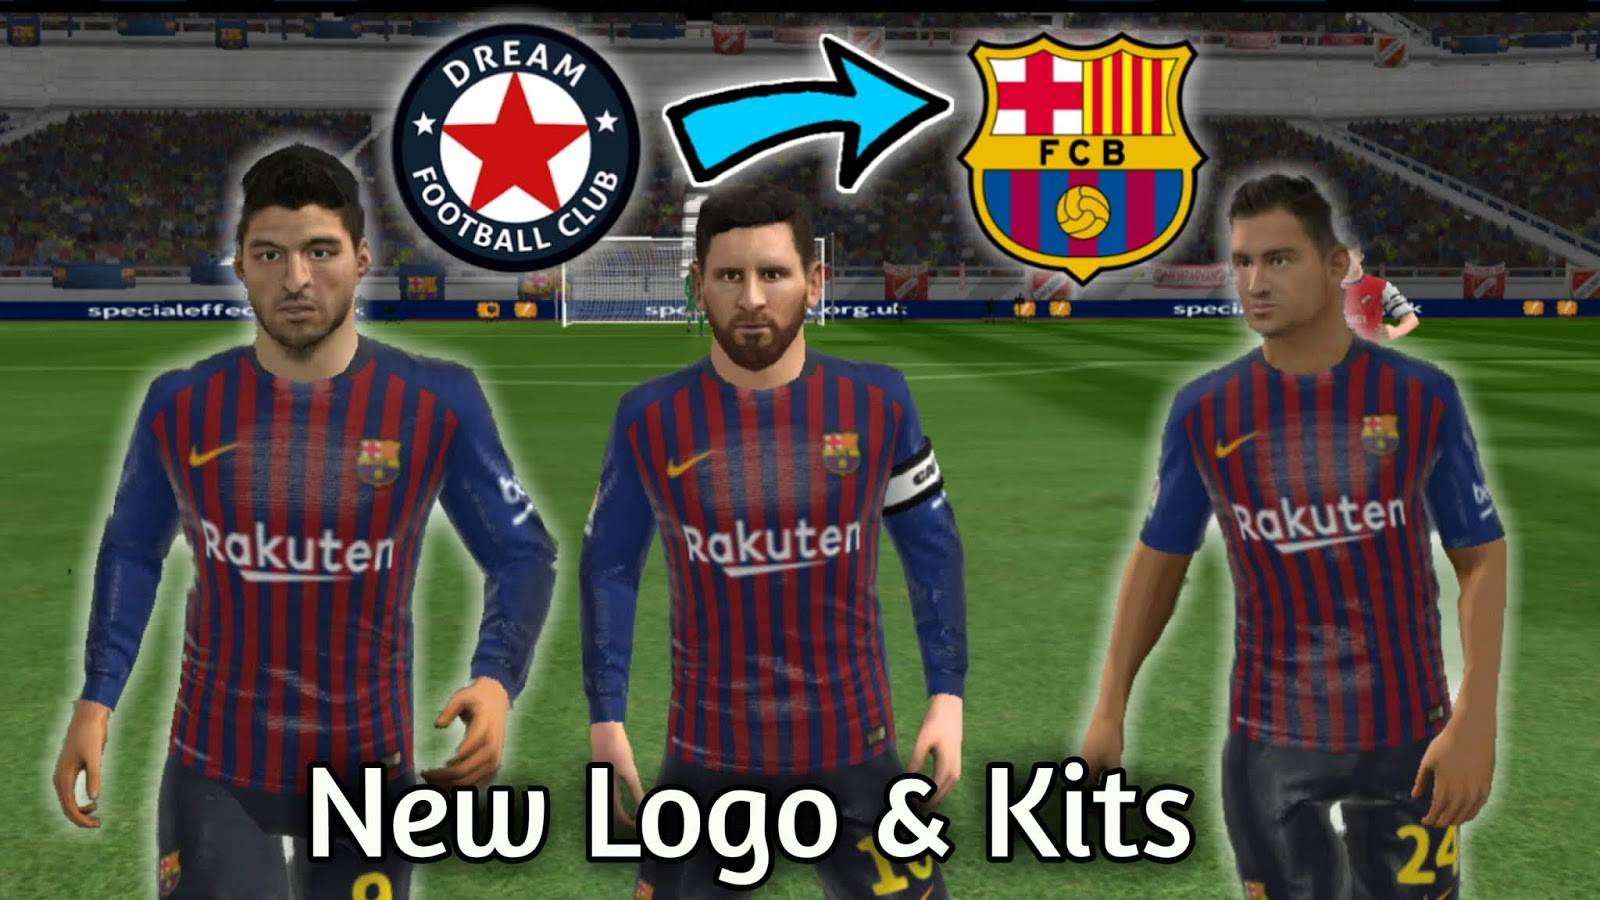 6bb34c2ac Fc Barcelona 2018-2019 Logo and Kits For Dream League Soccer